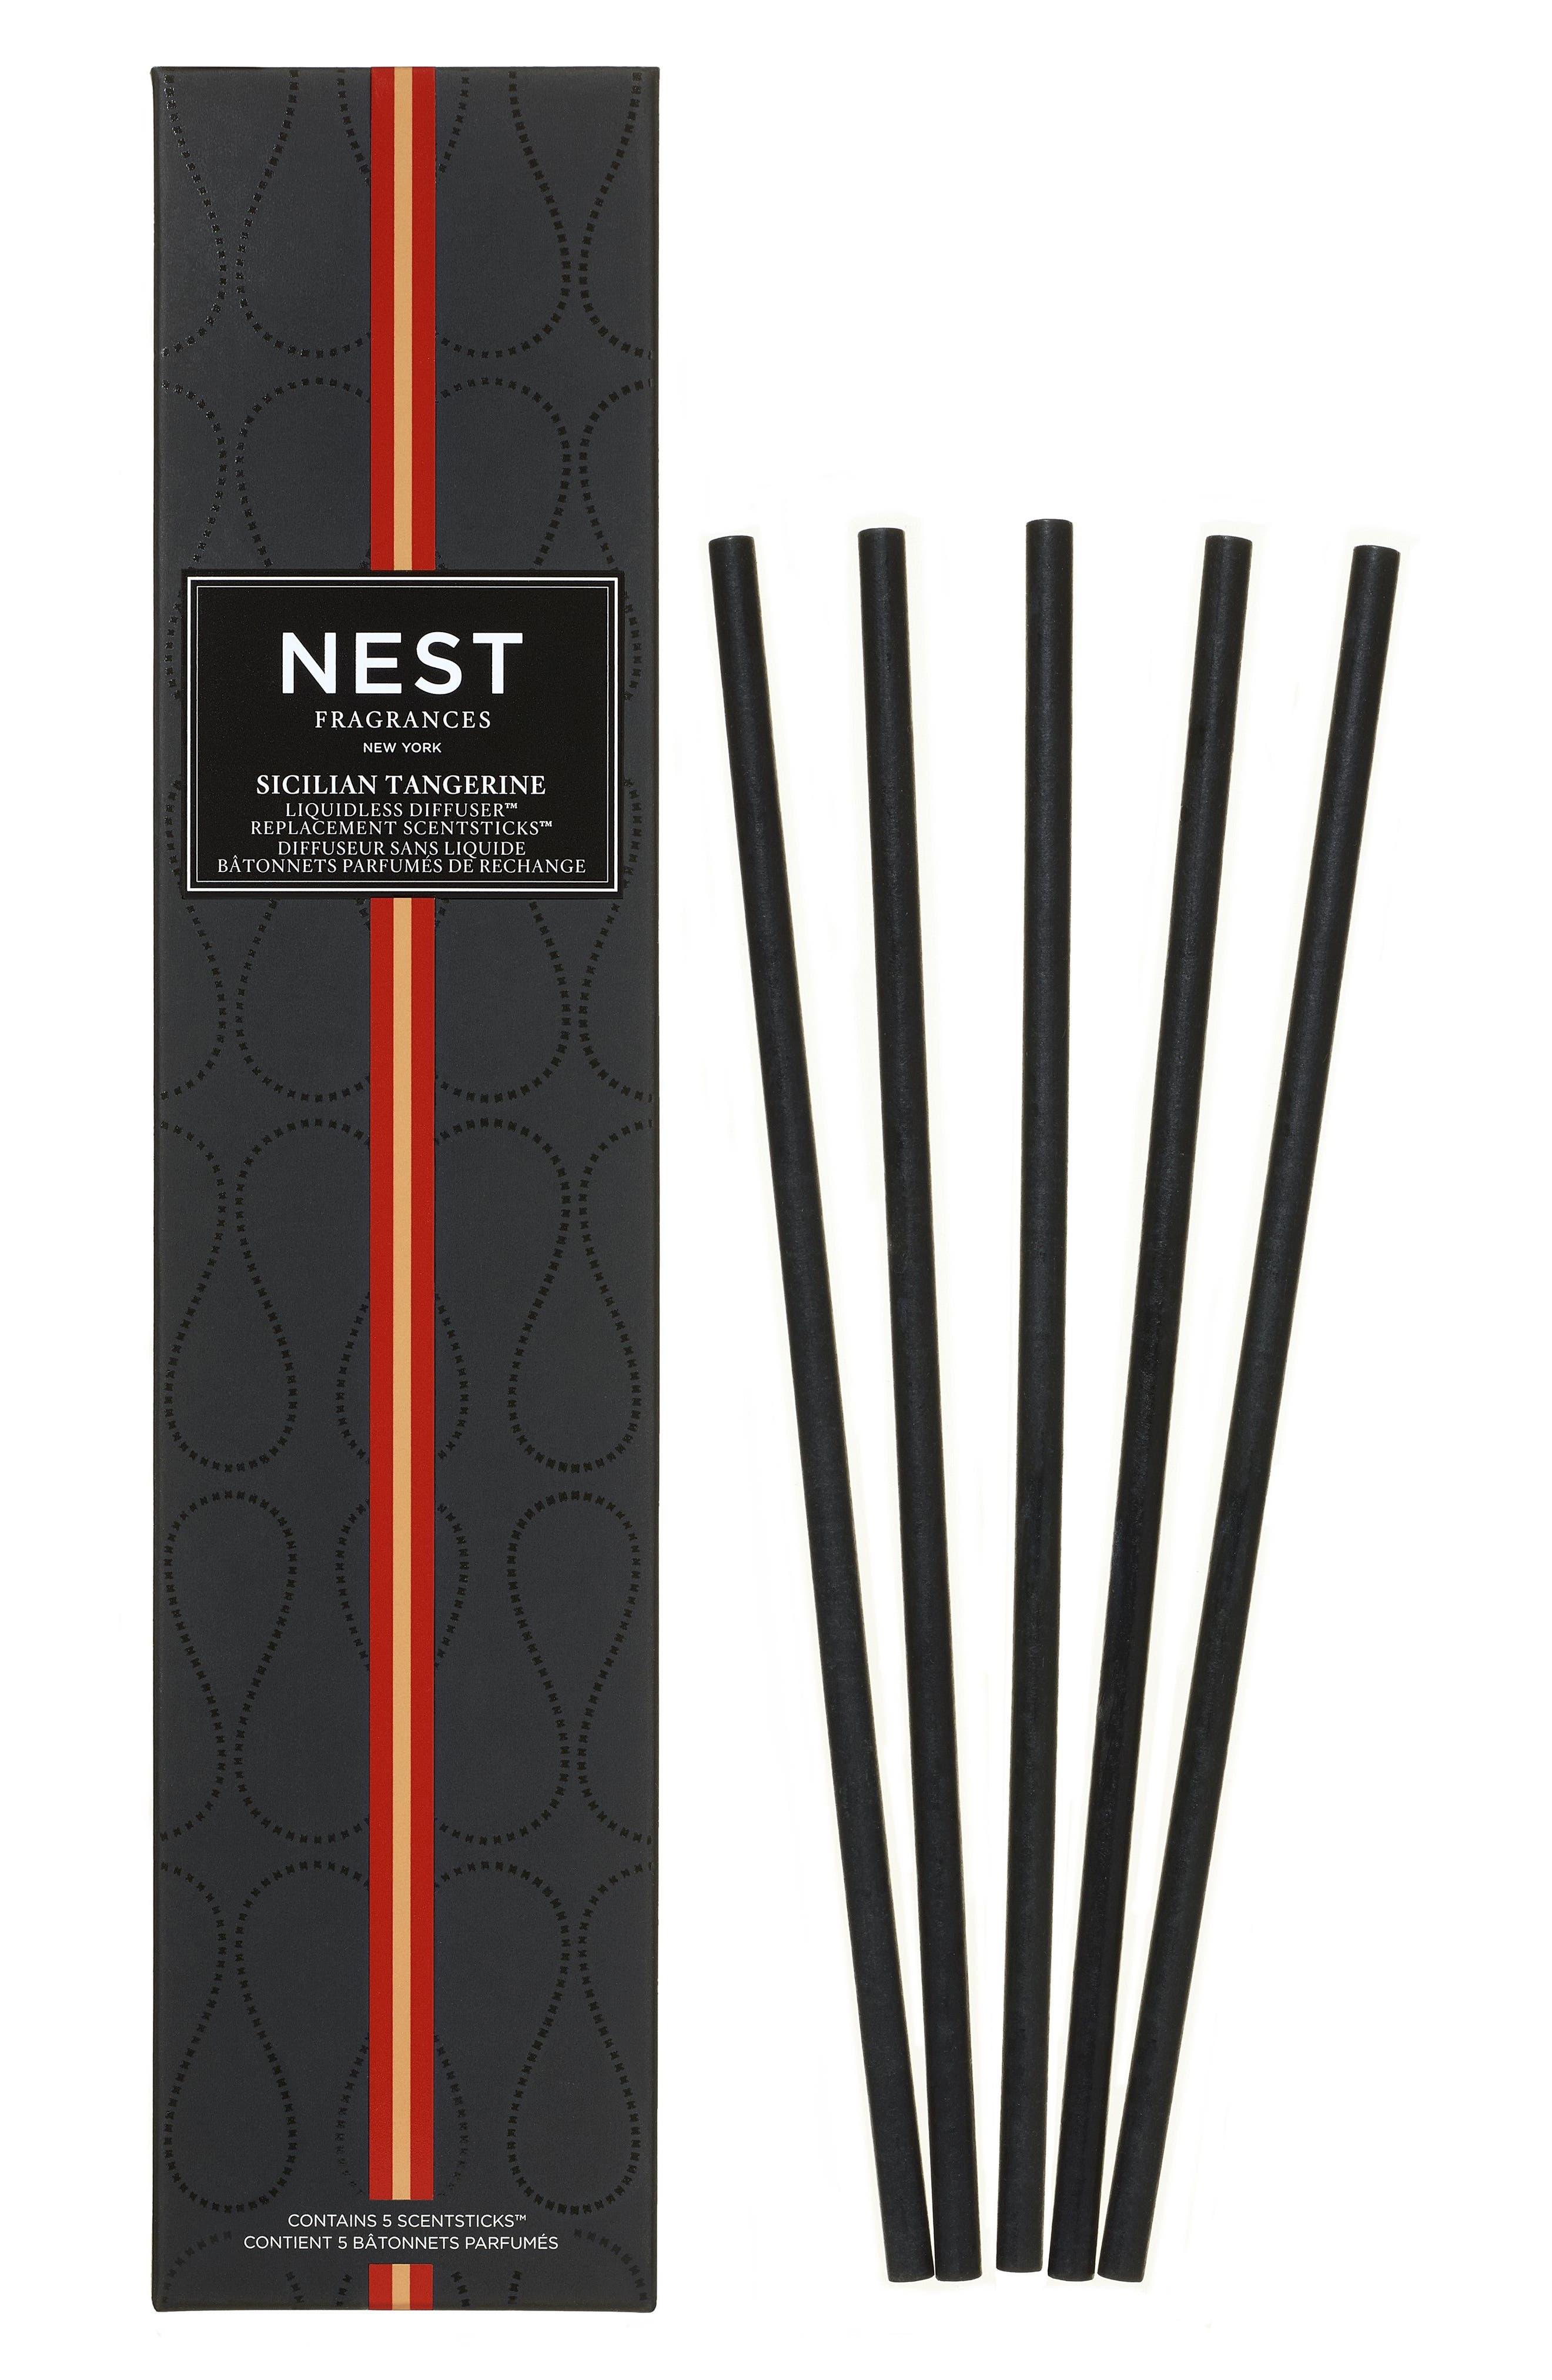 Main Image - NEST Fragrances Sicilian Tangerine Liquidless Diffuser Refill